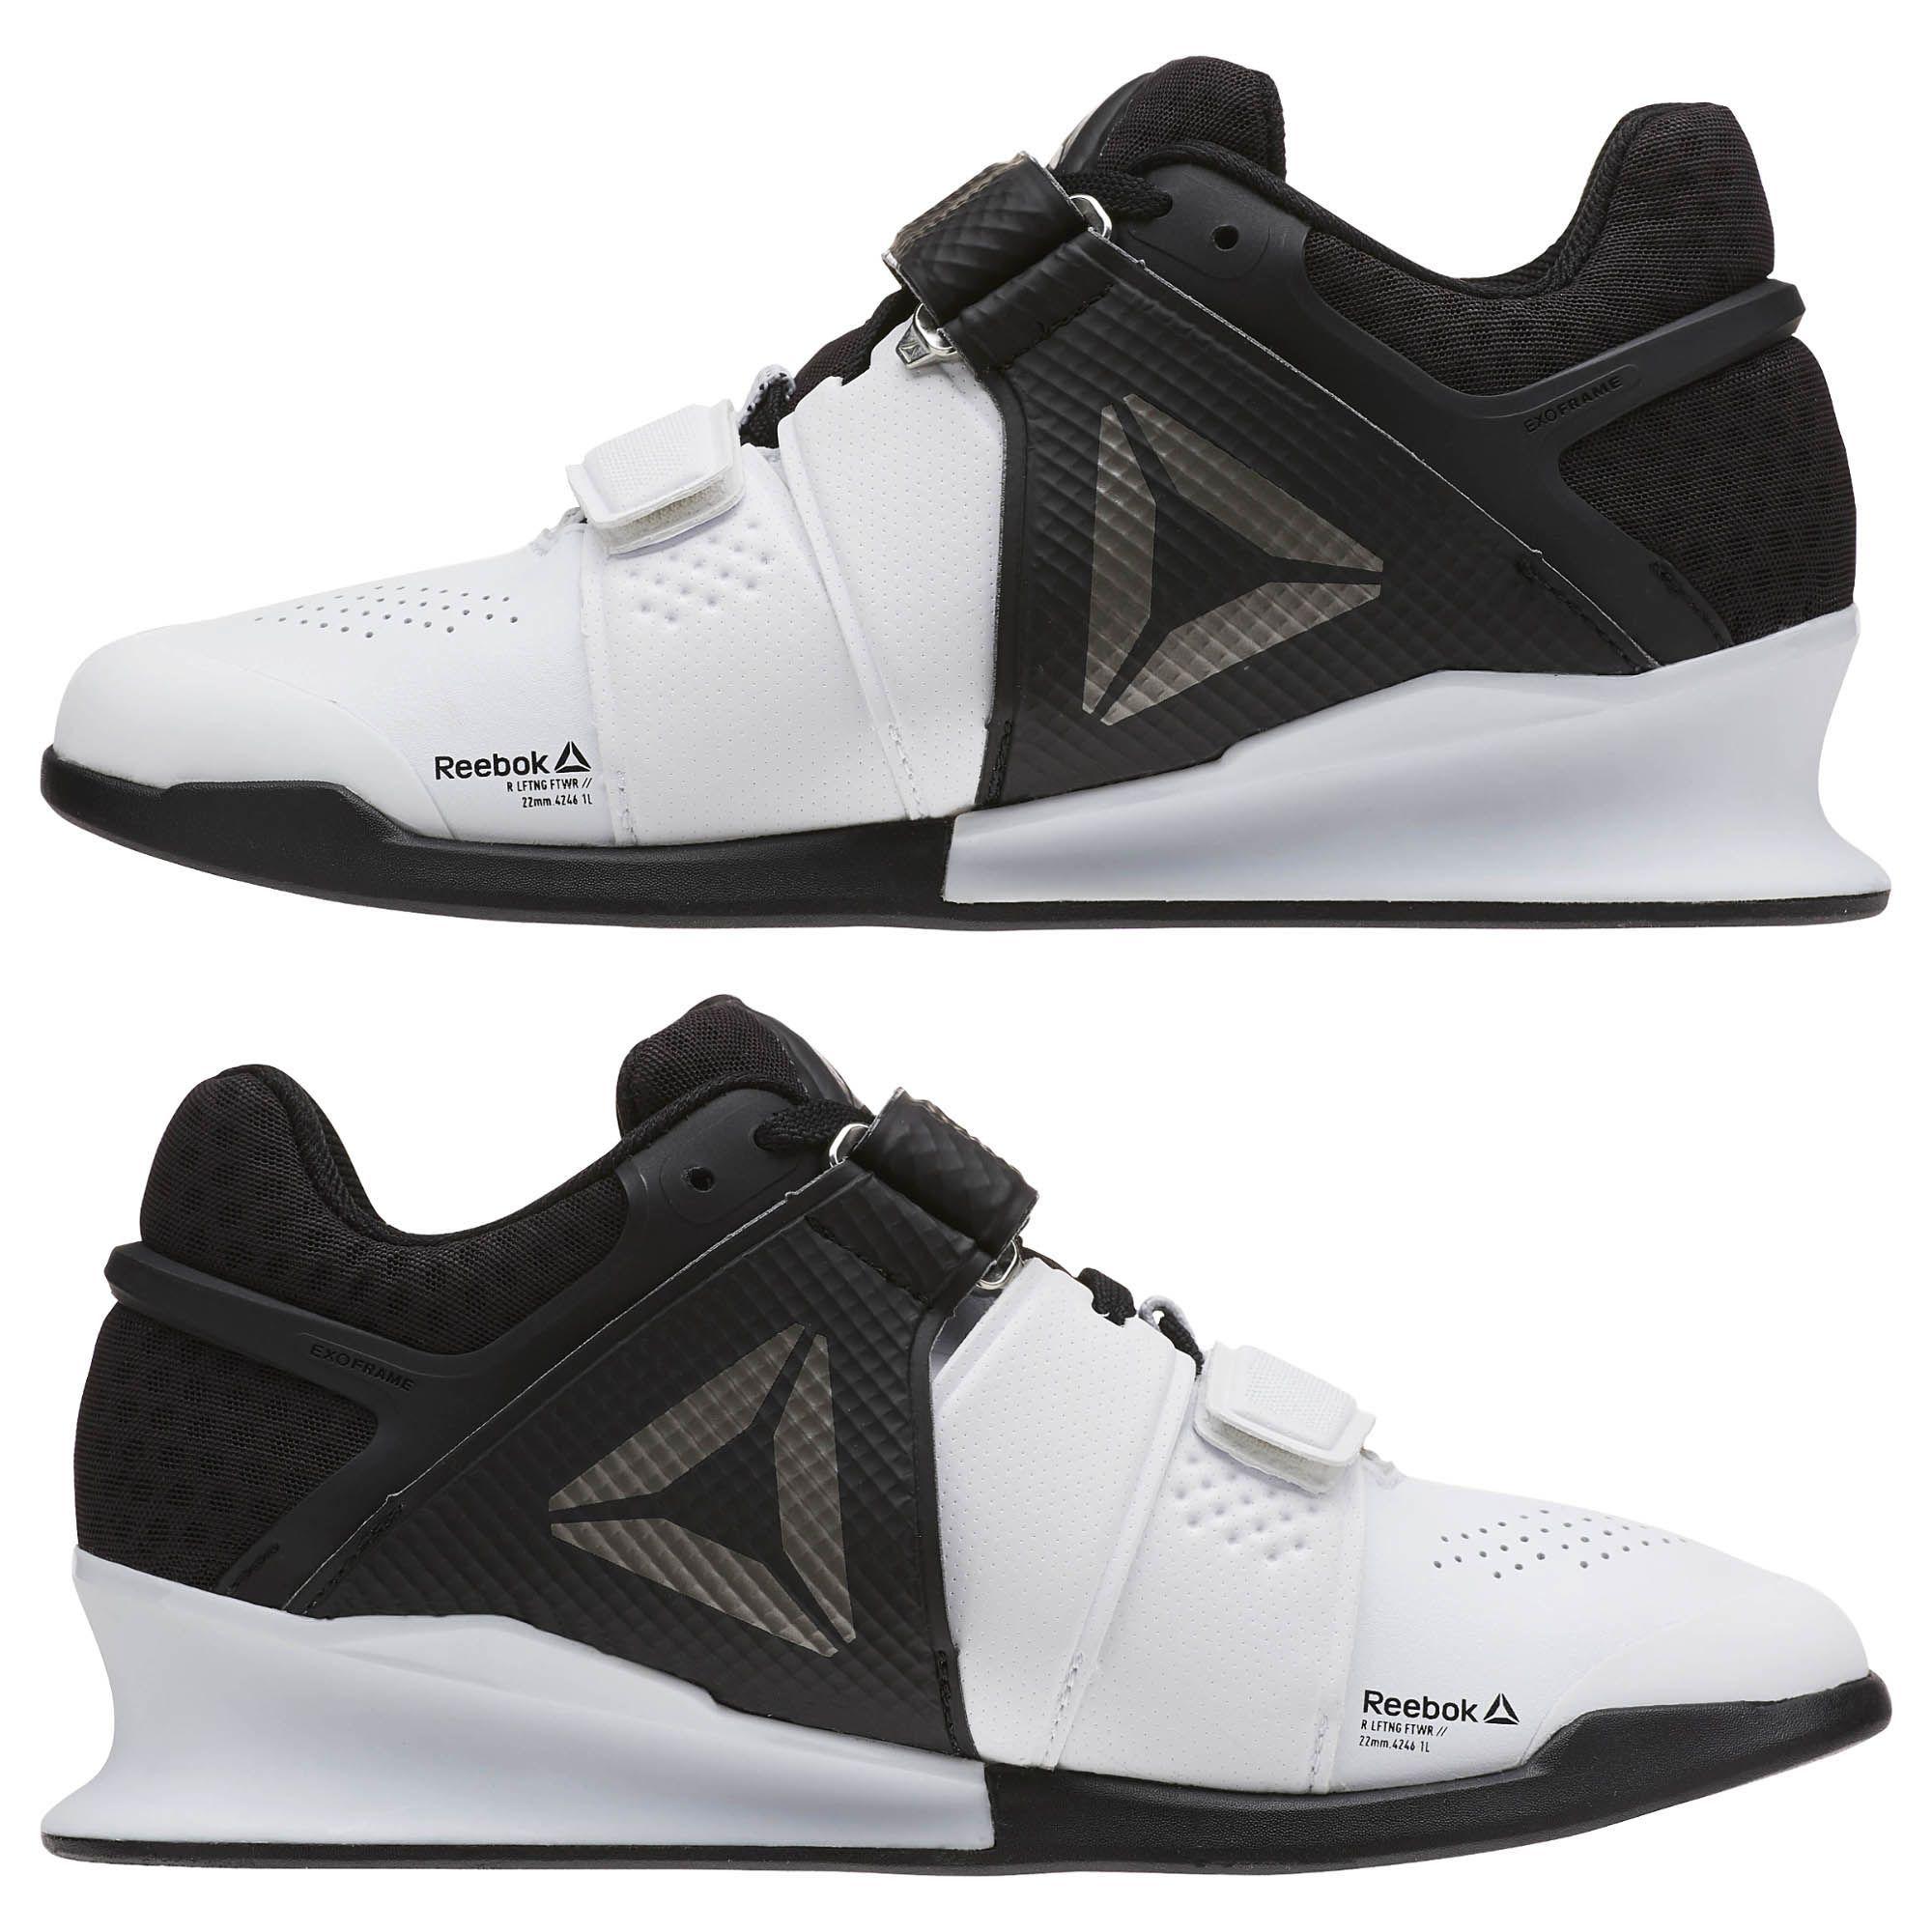 05f3db3b7 Reebok Shoes Women s Legacy Lifter in White Black Pewter Size 10 ...